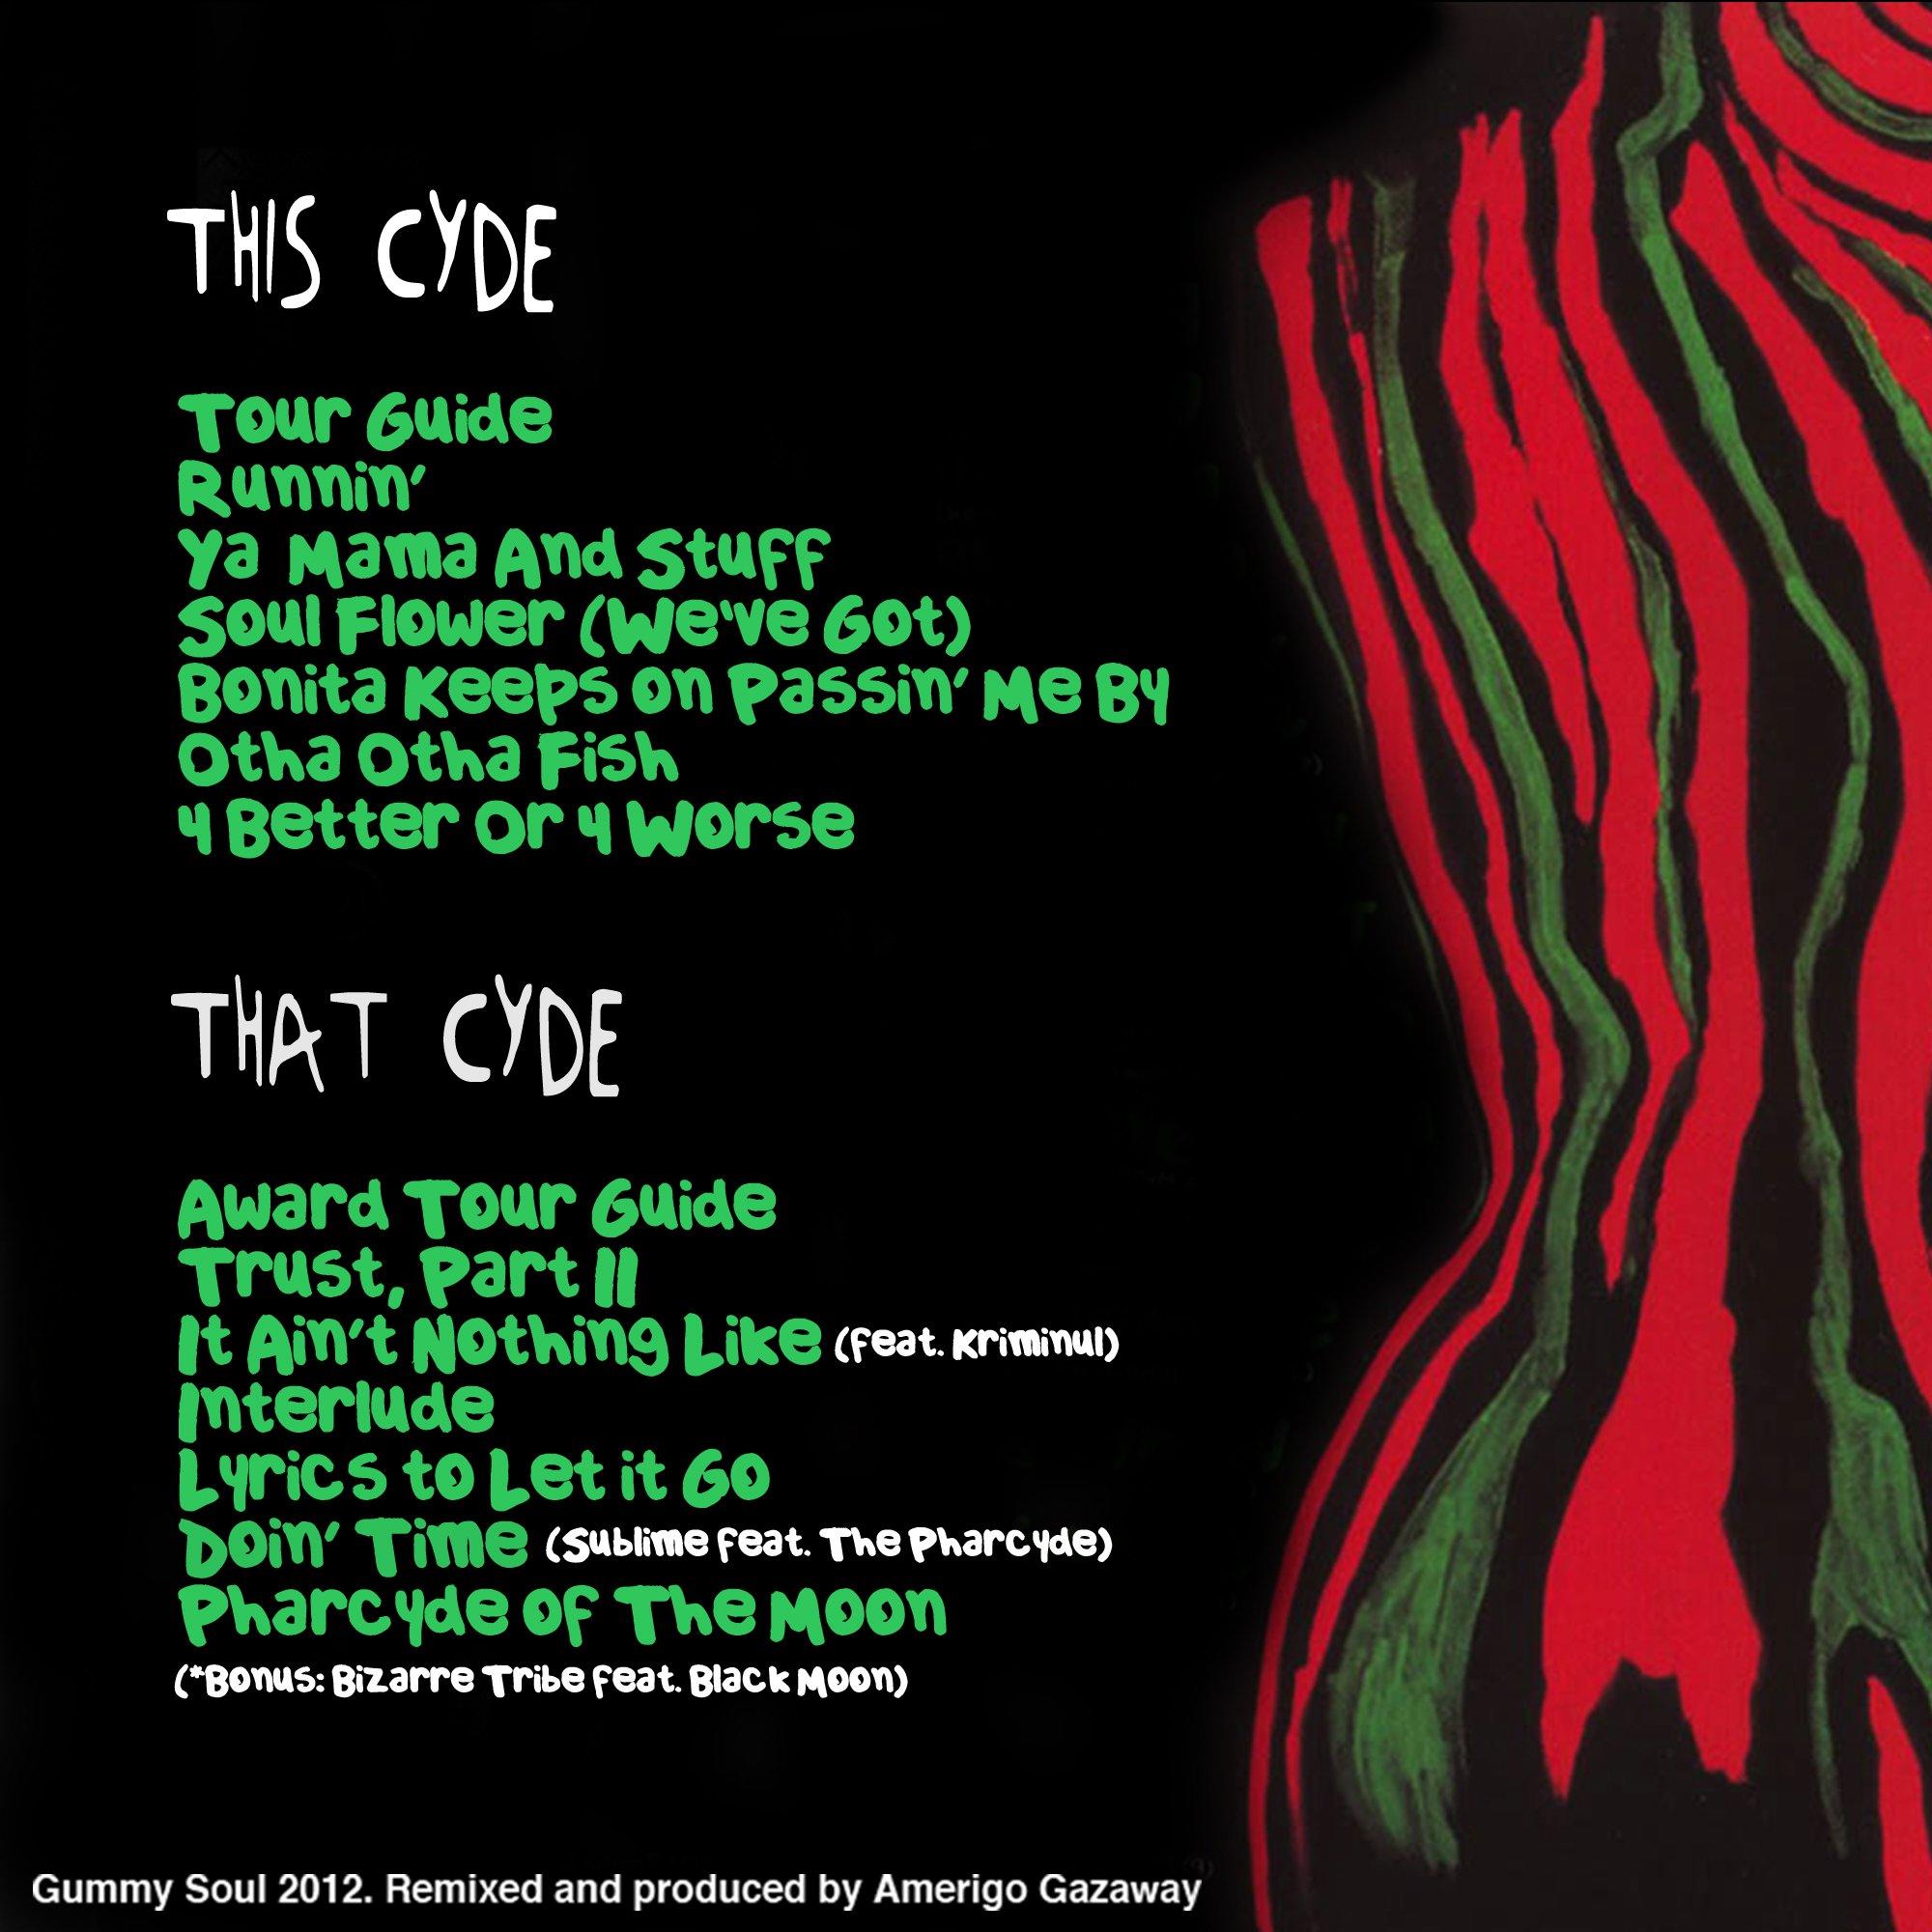 00 Amerigo Gazaway of Gummy Soul - Bizarre Tribe- A Quest to The Pharcyde (Instrumentals)